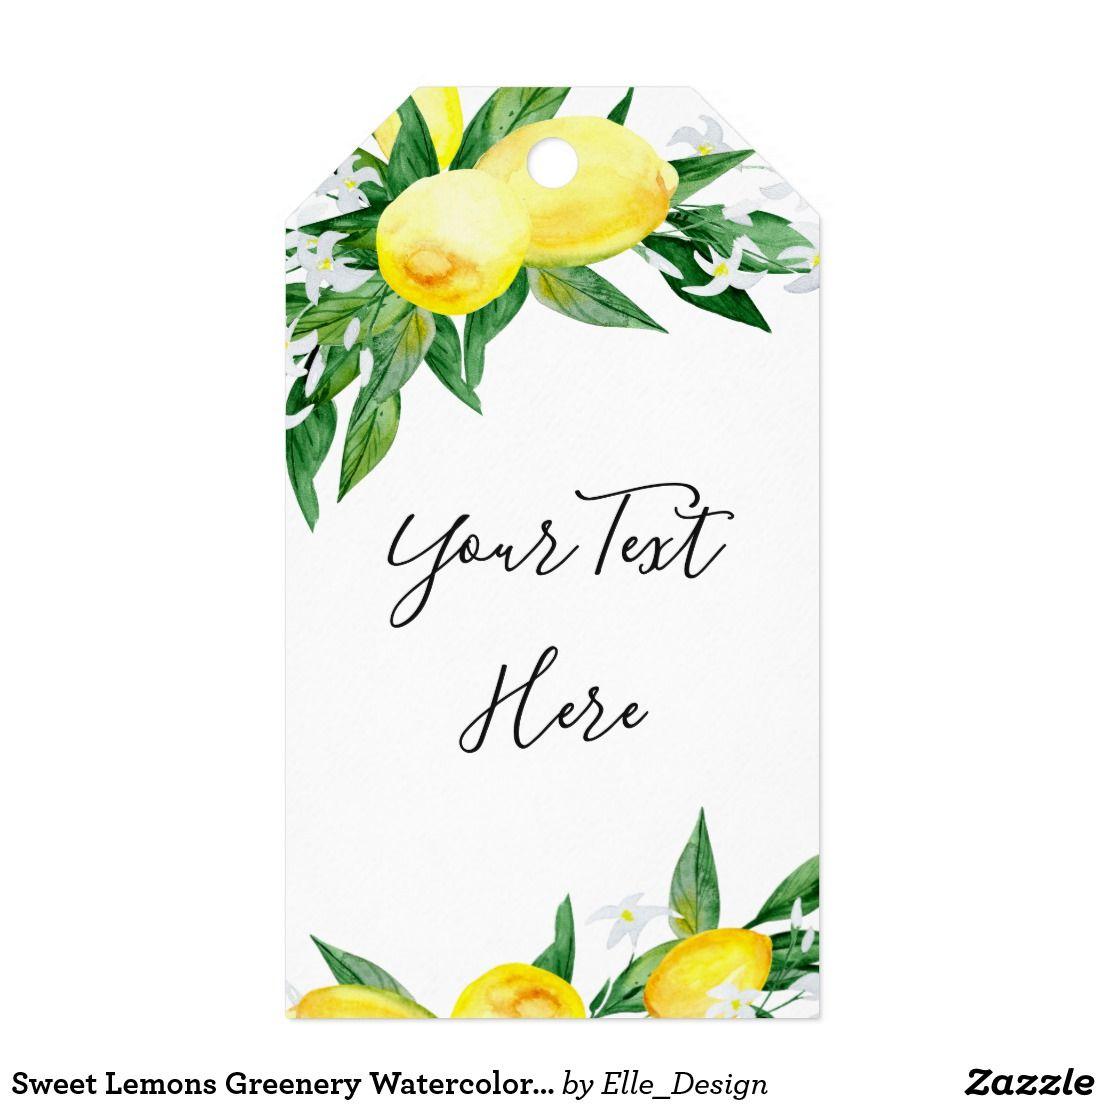 Sweet Lemons Greenery Watercolor Gift Favor Tag Zazzle Com Watercolour Gift Favor Tags Personalized Gift Tags